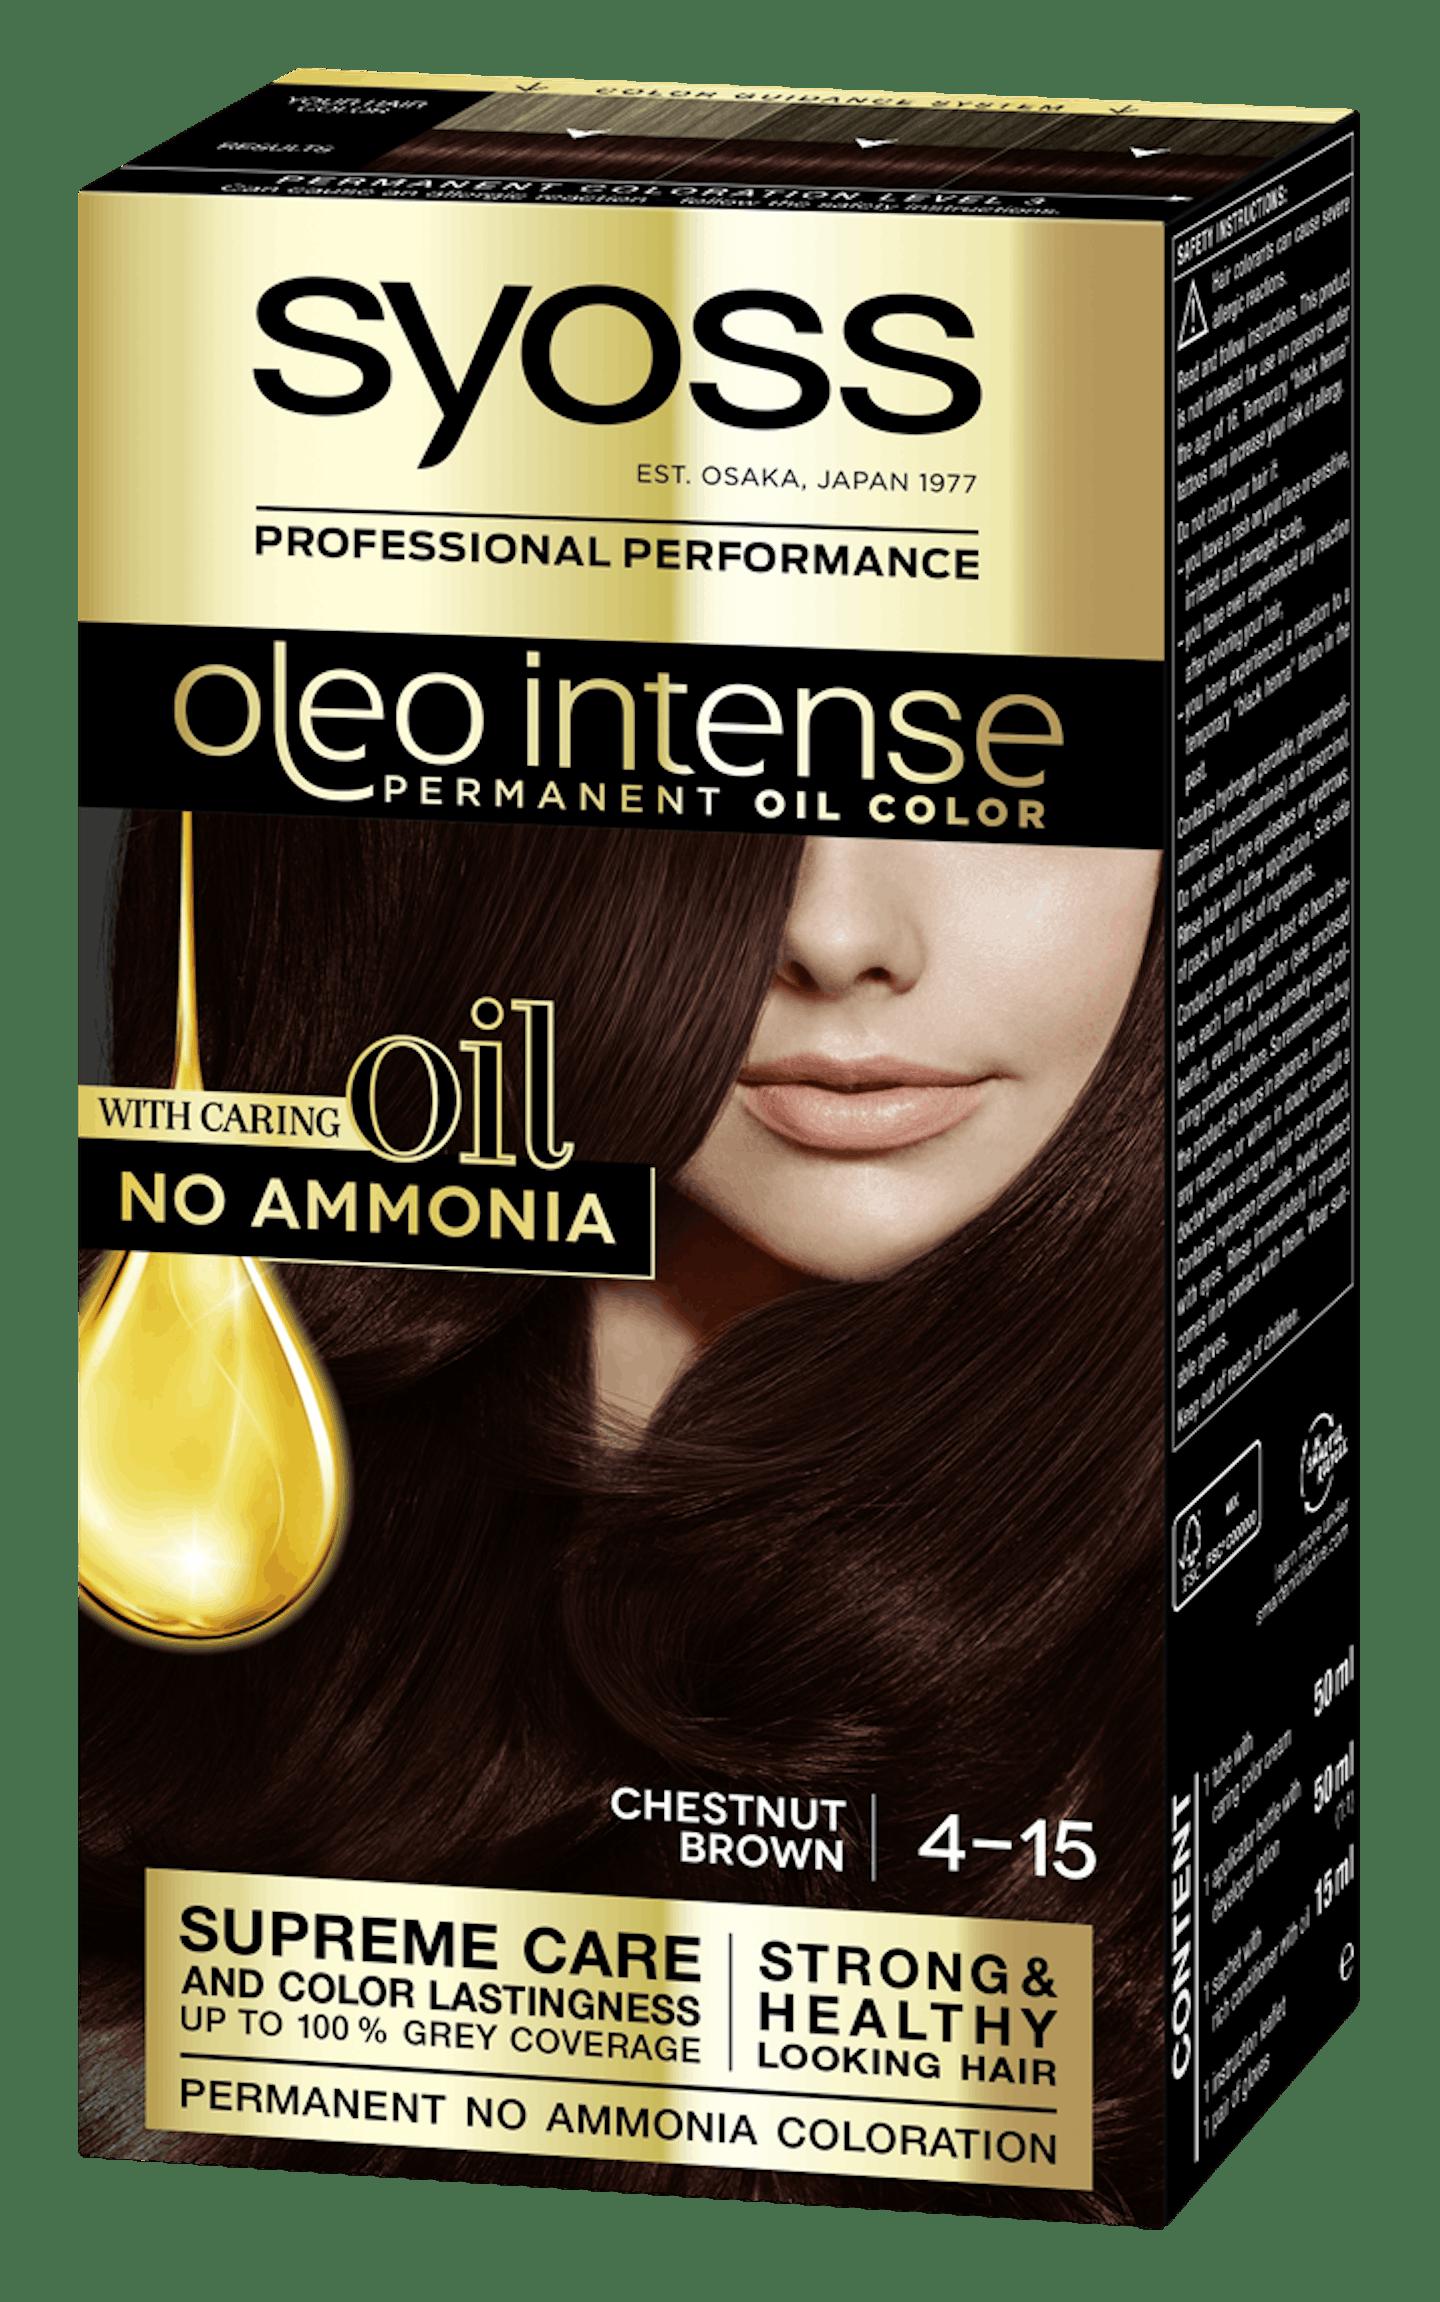 Syoss Oleo Intense Kestenjasto smeđa 4-15